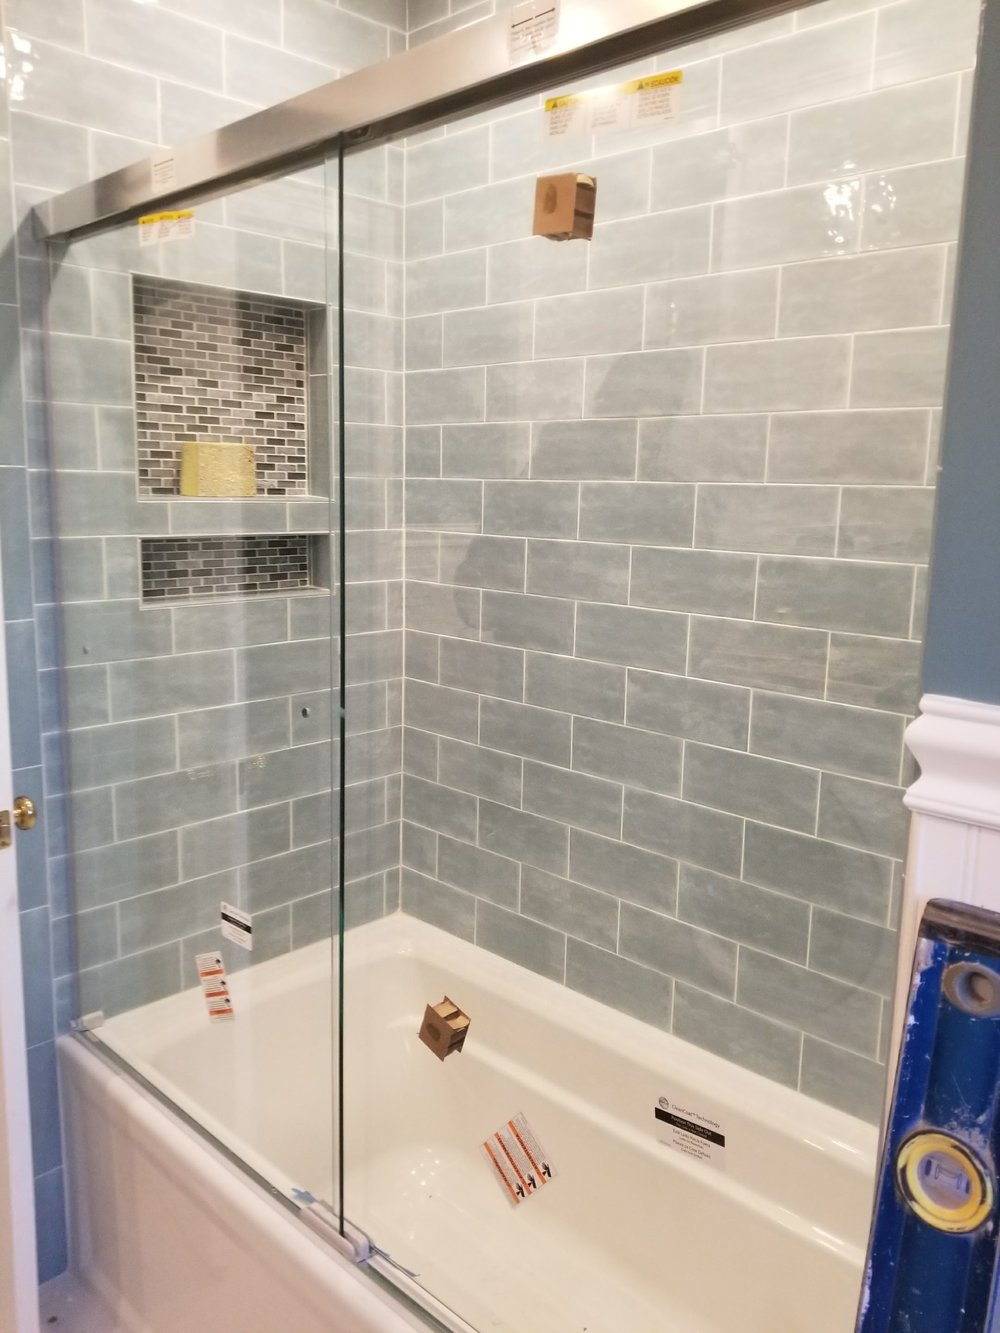 Shaw Remodeling - Progress photo - Bathroom Remodel in East Lyme CT  (4).jpg